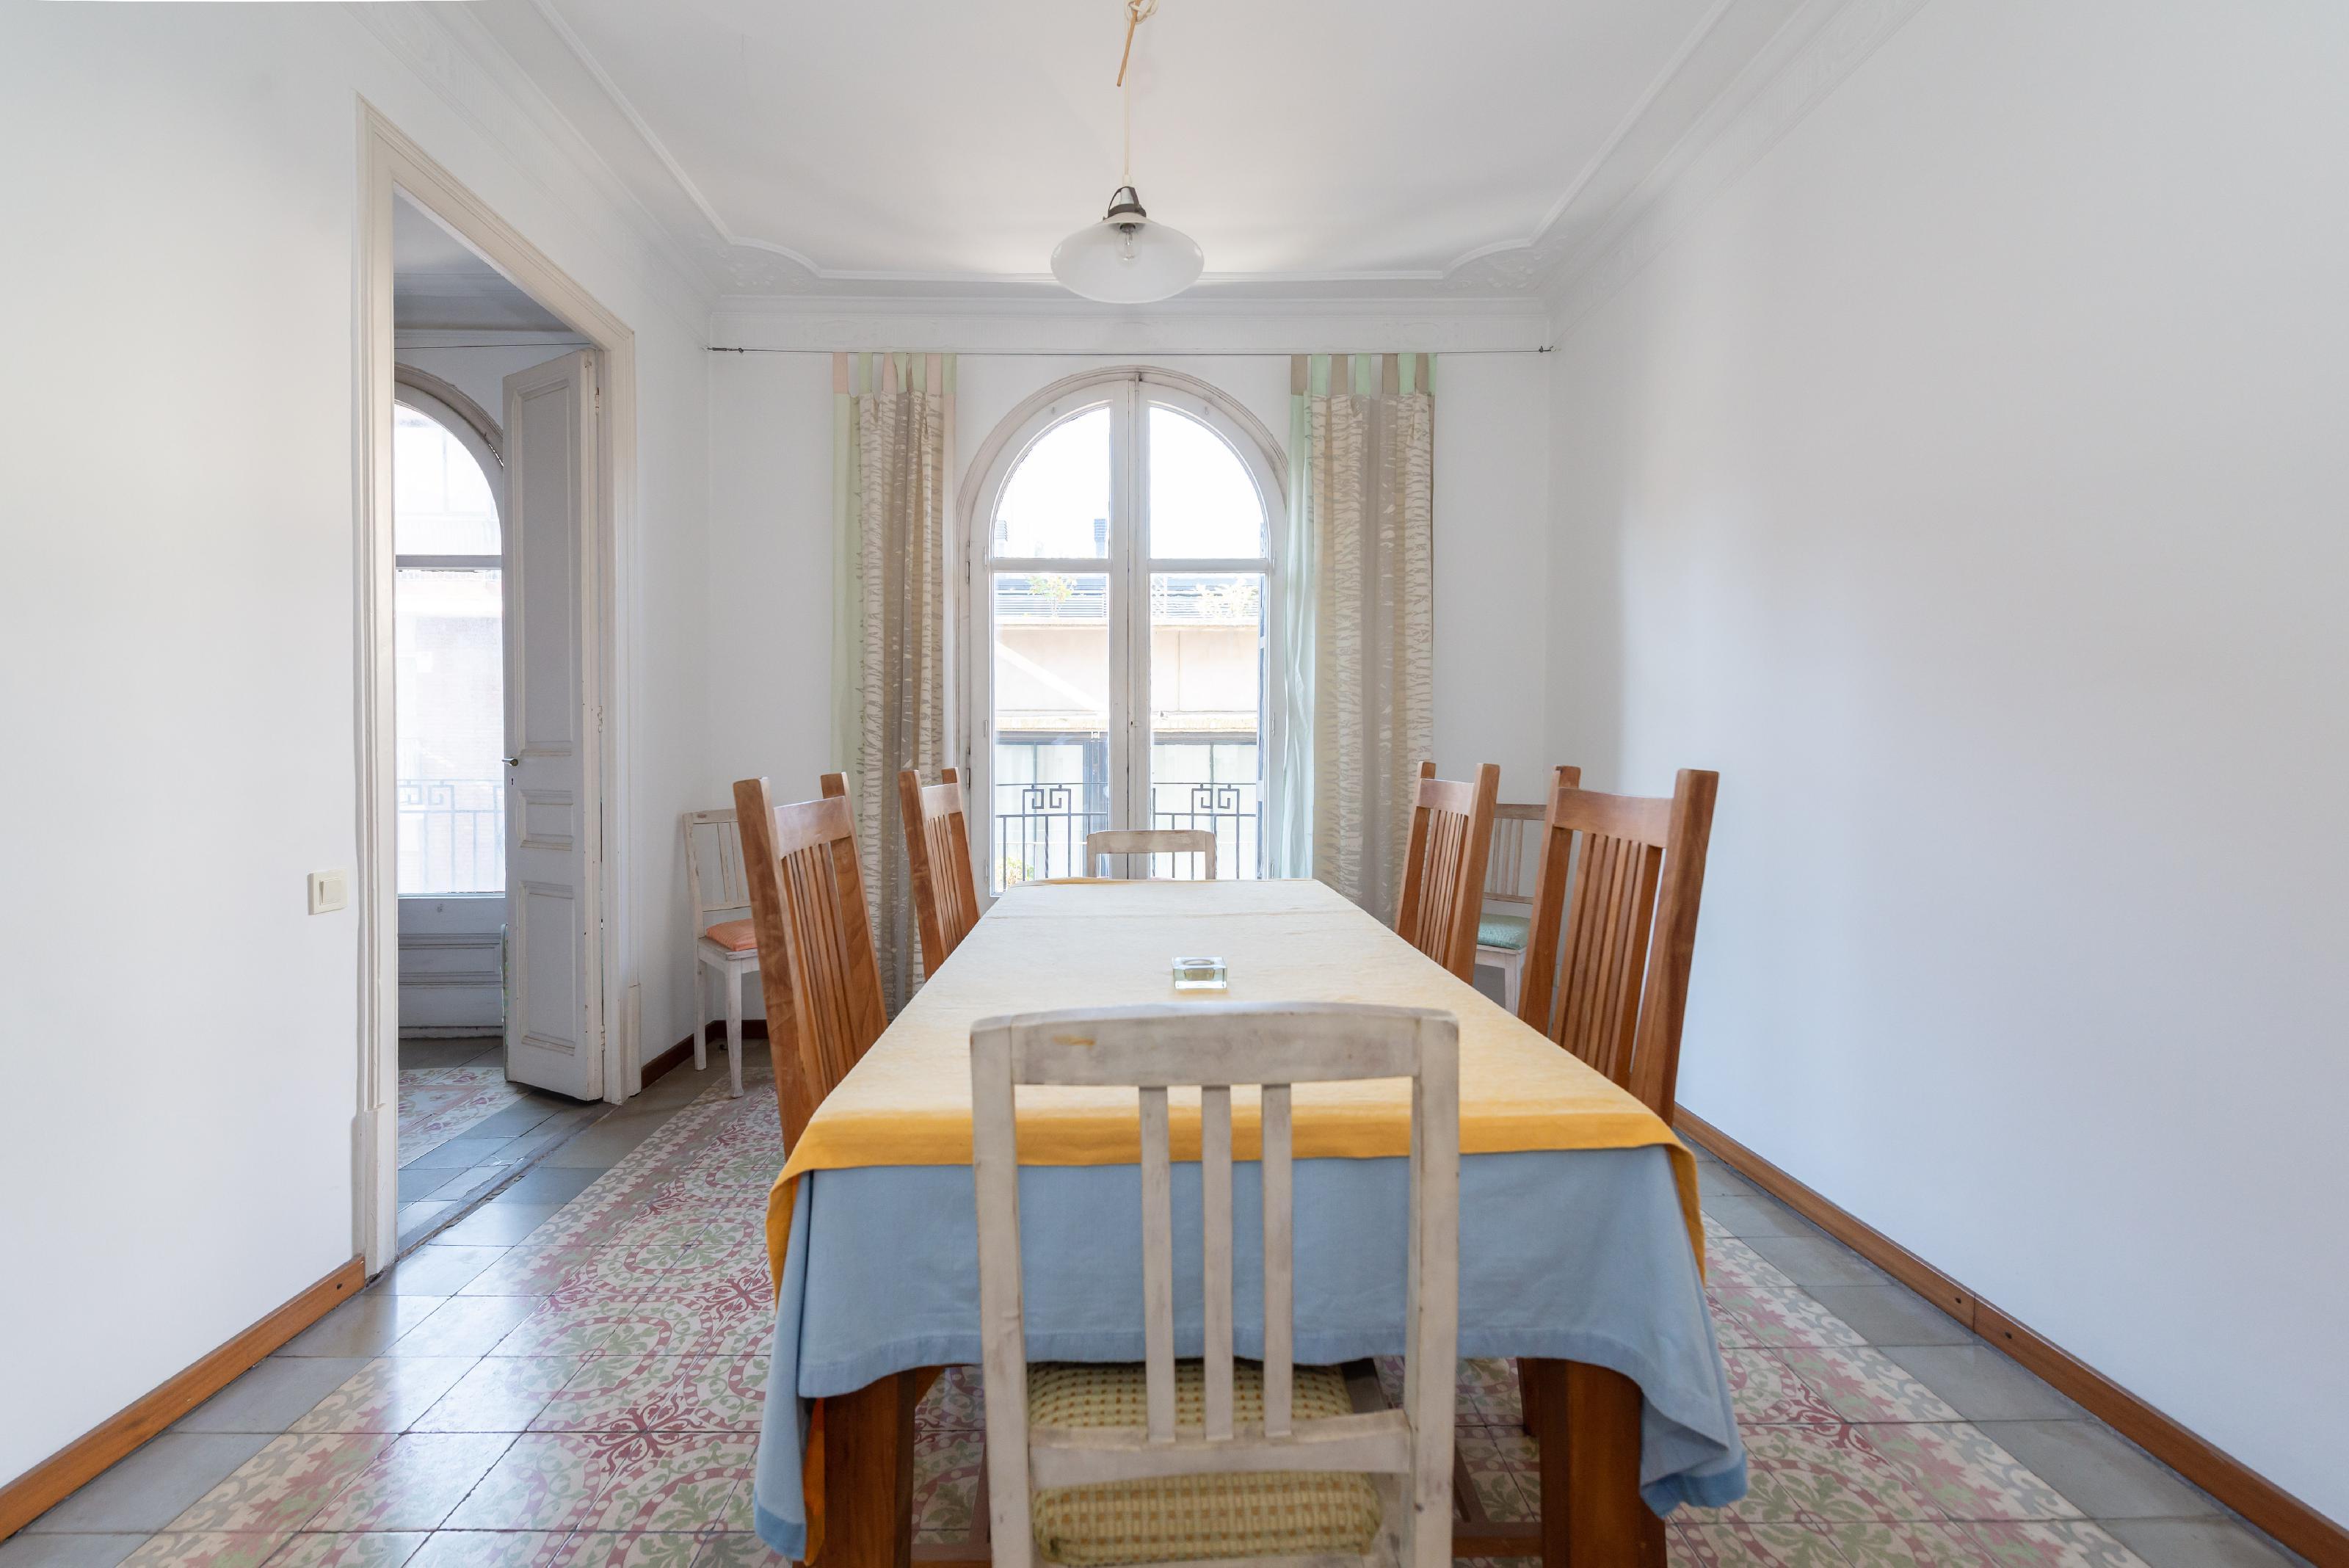 250582 Flat for sale in Sarrià-Sant Gervasi, Sant Gervasi-Galvany 1